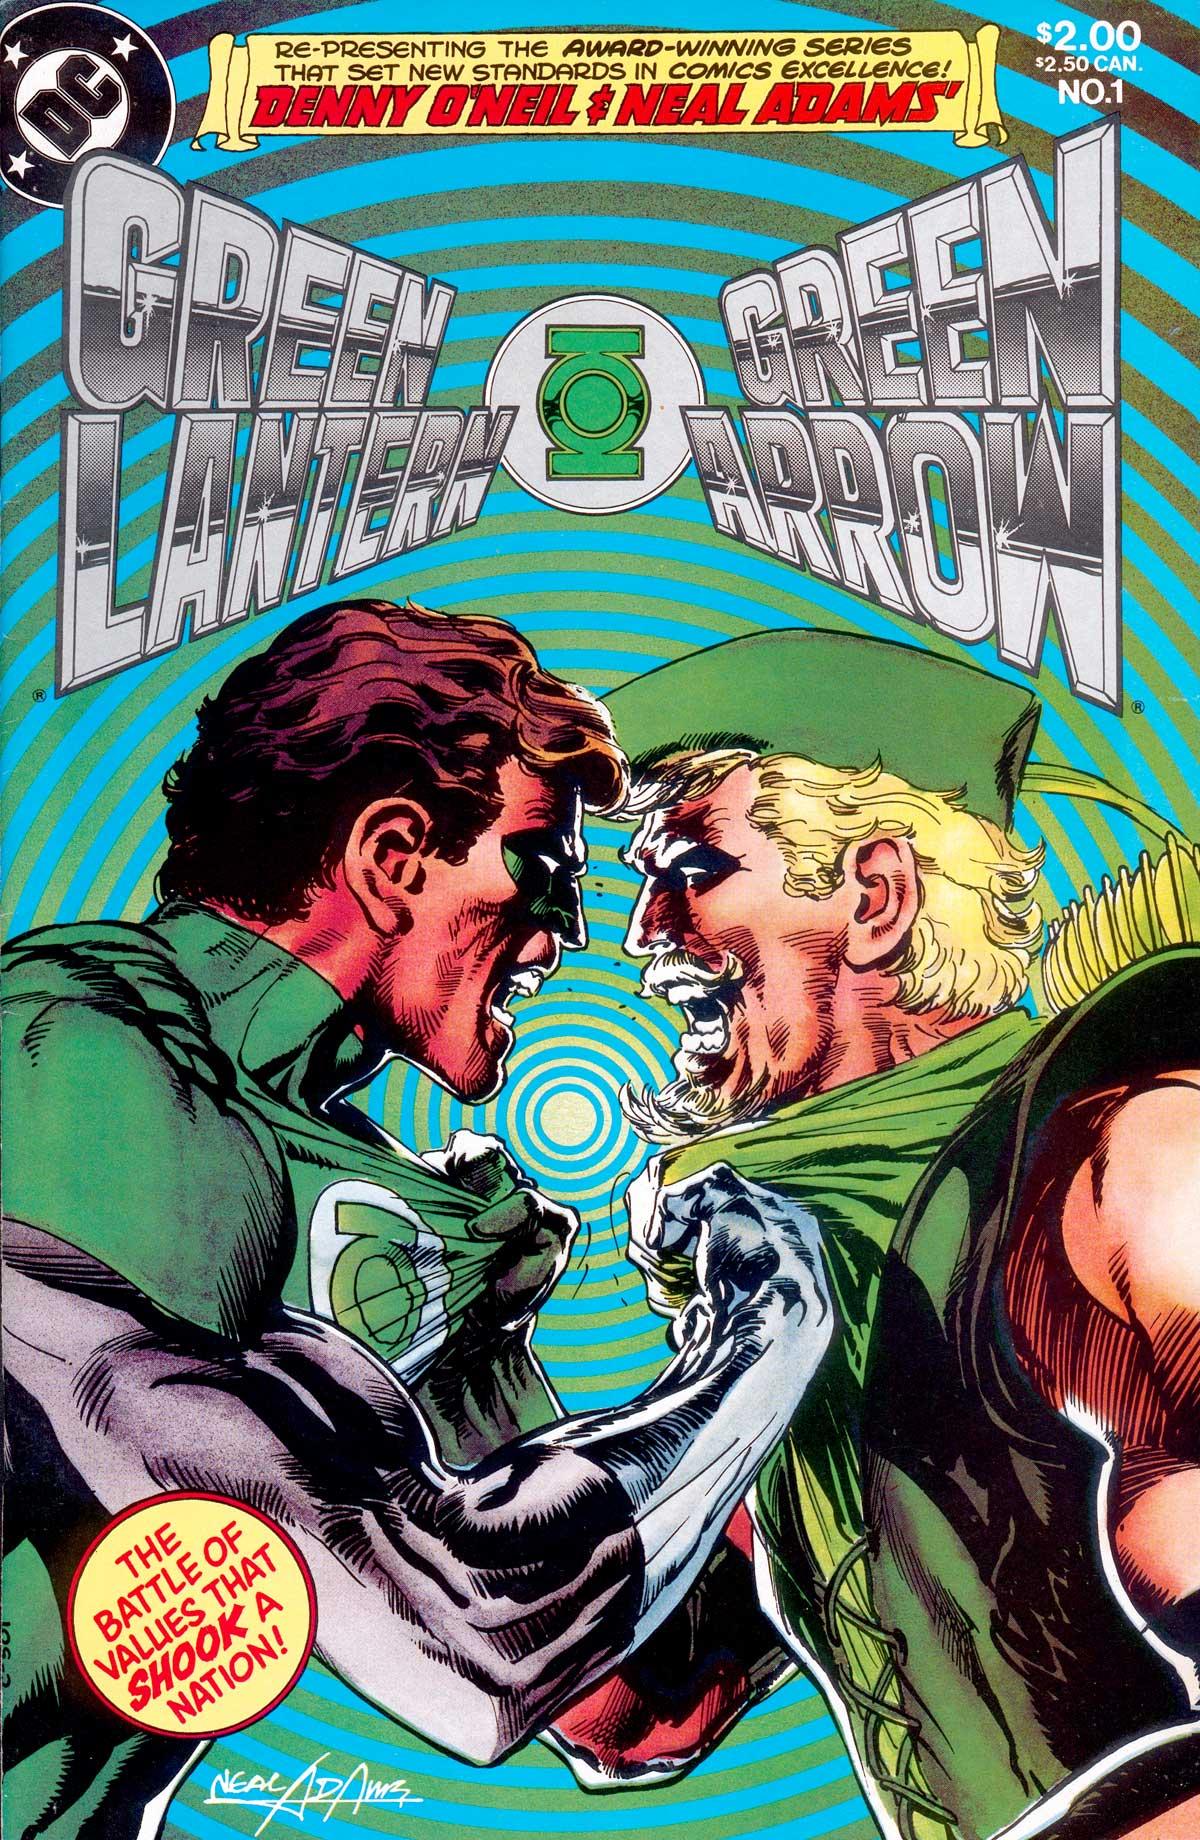 Harley Quinn Green Lantern Ring